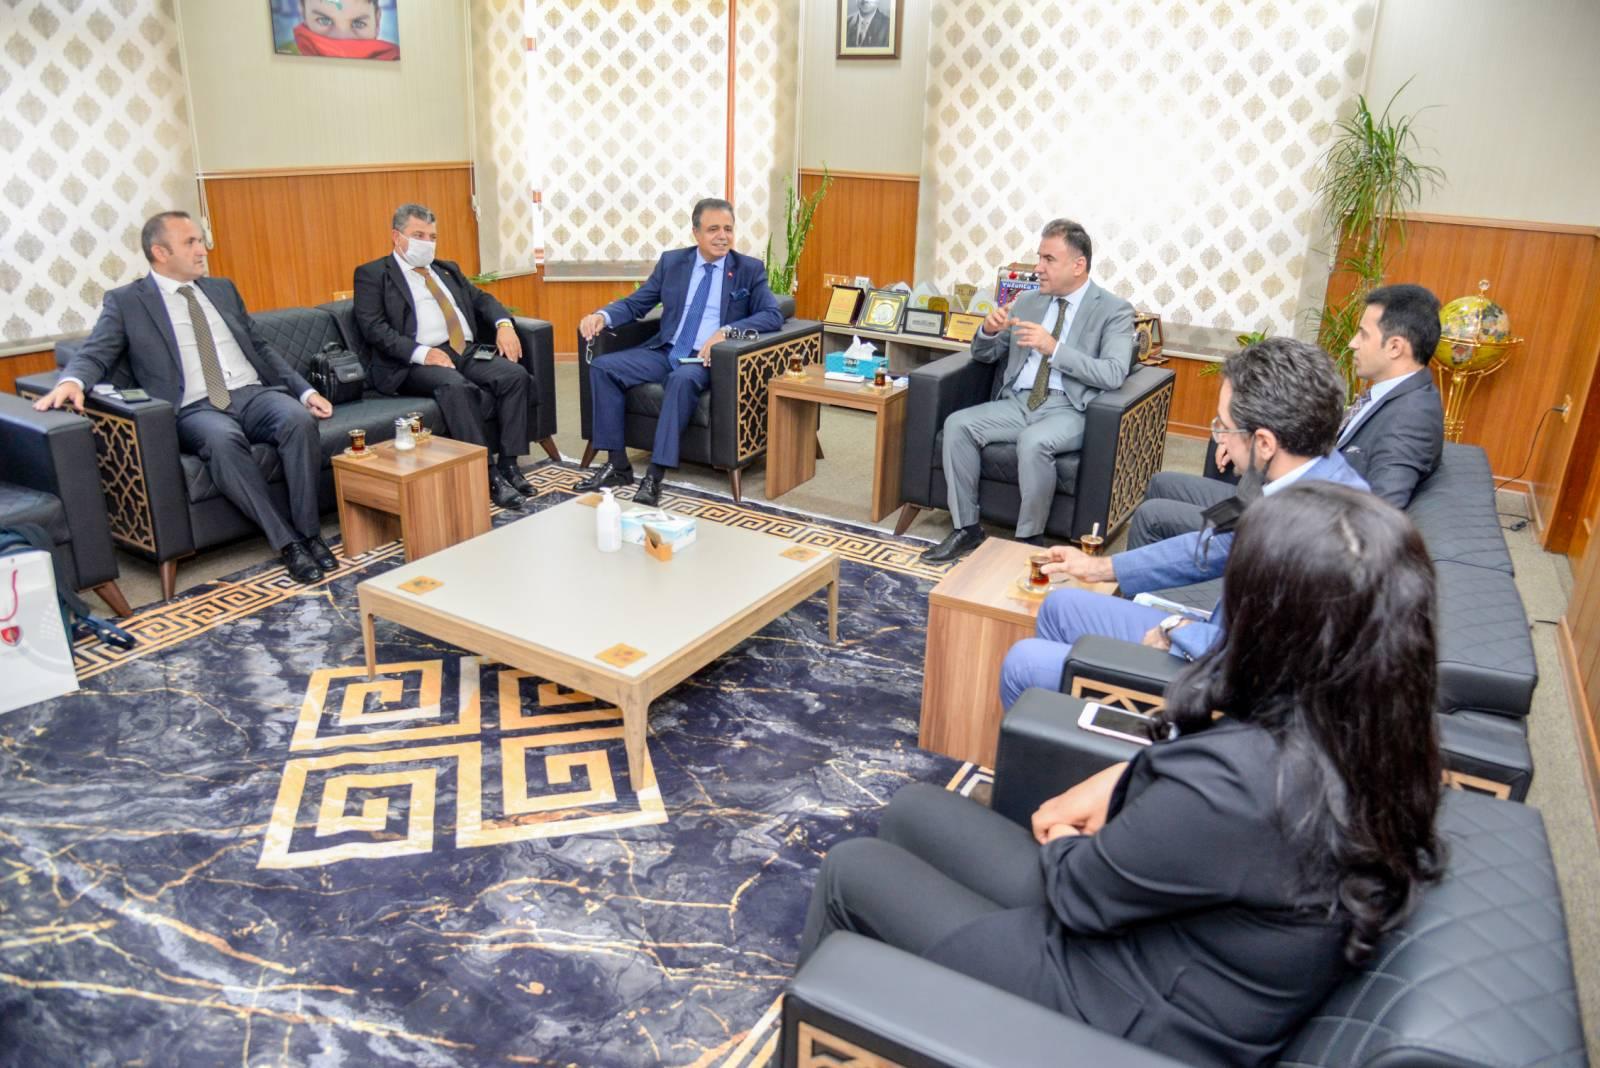 Presidency Of The EPU Receives International Universities Committee (IUC)